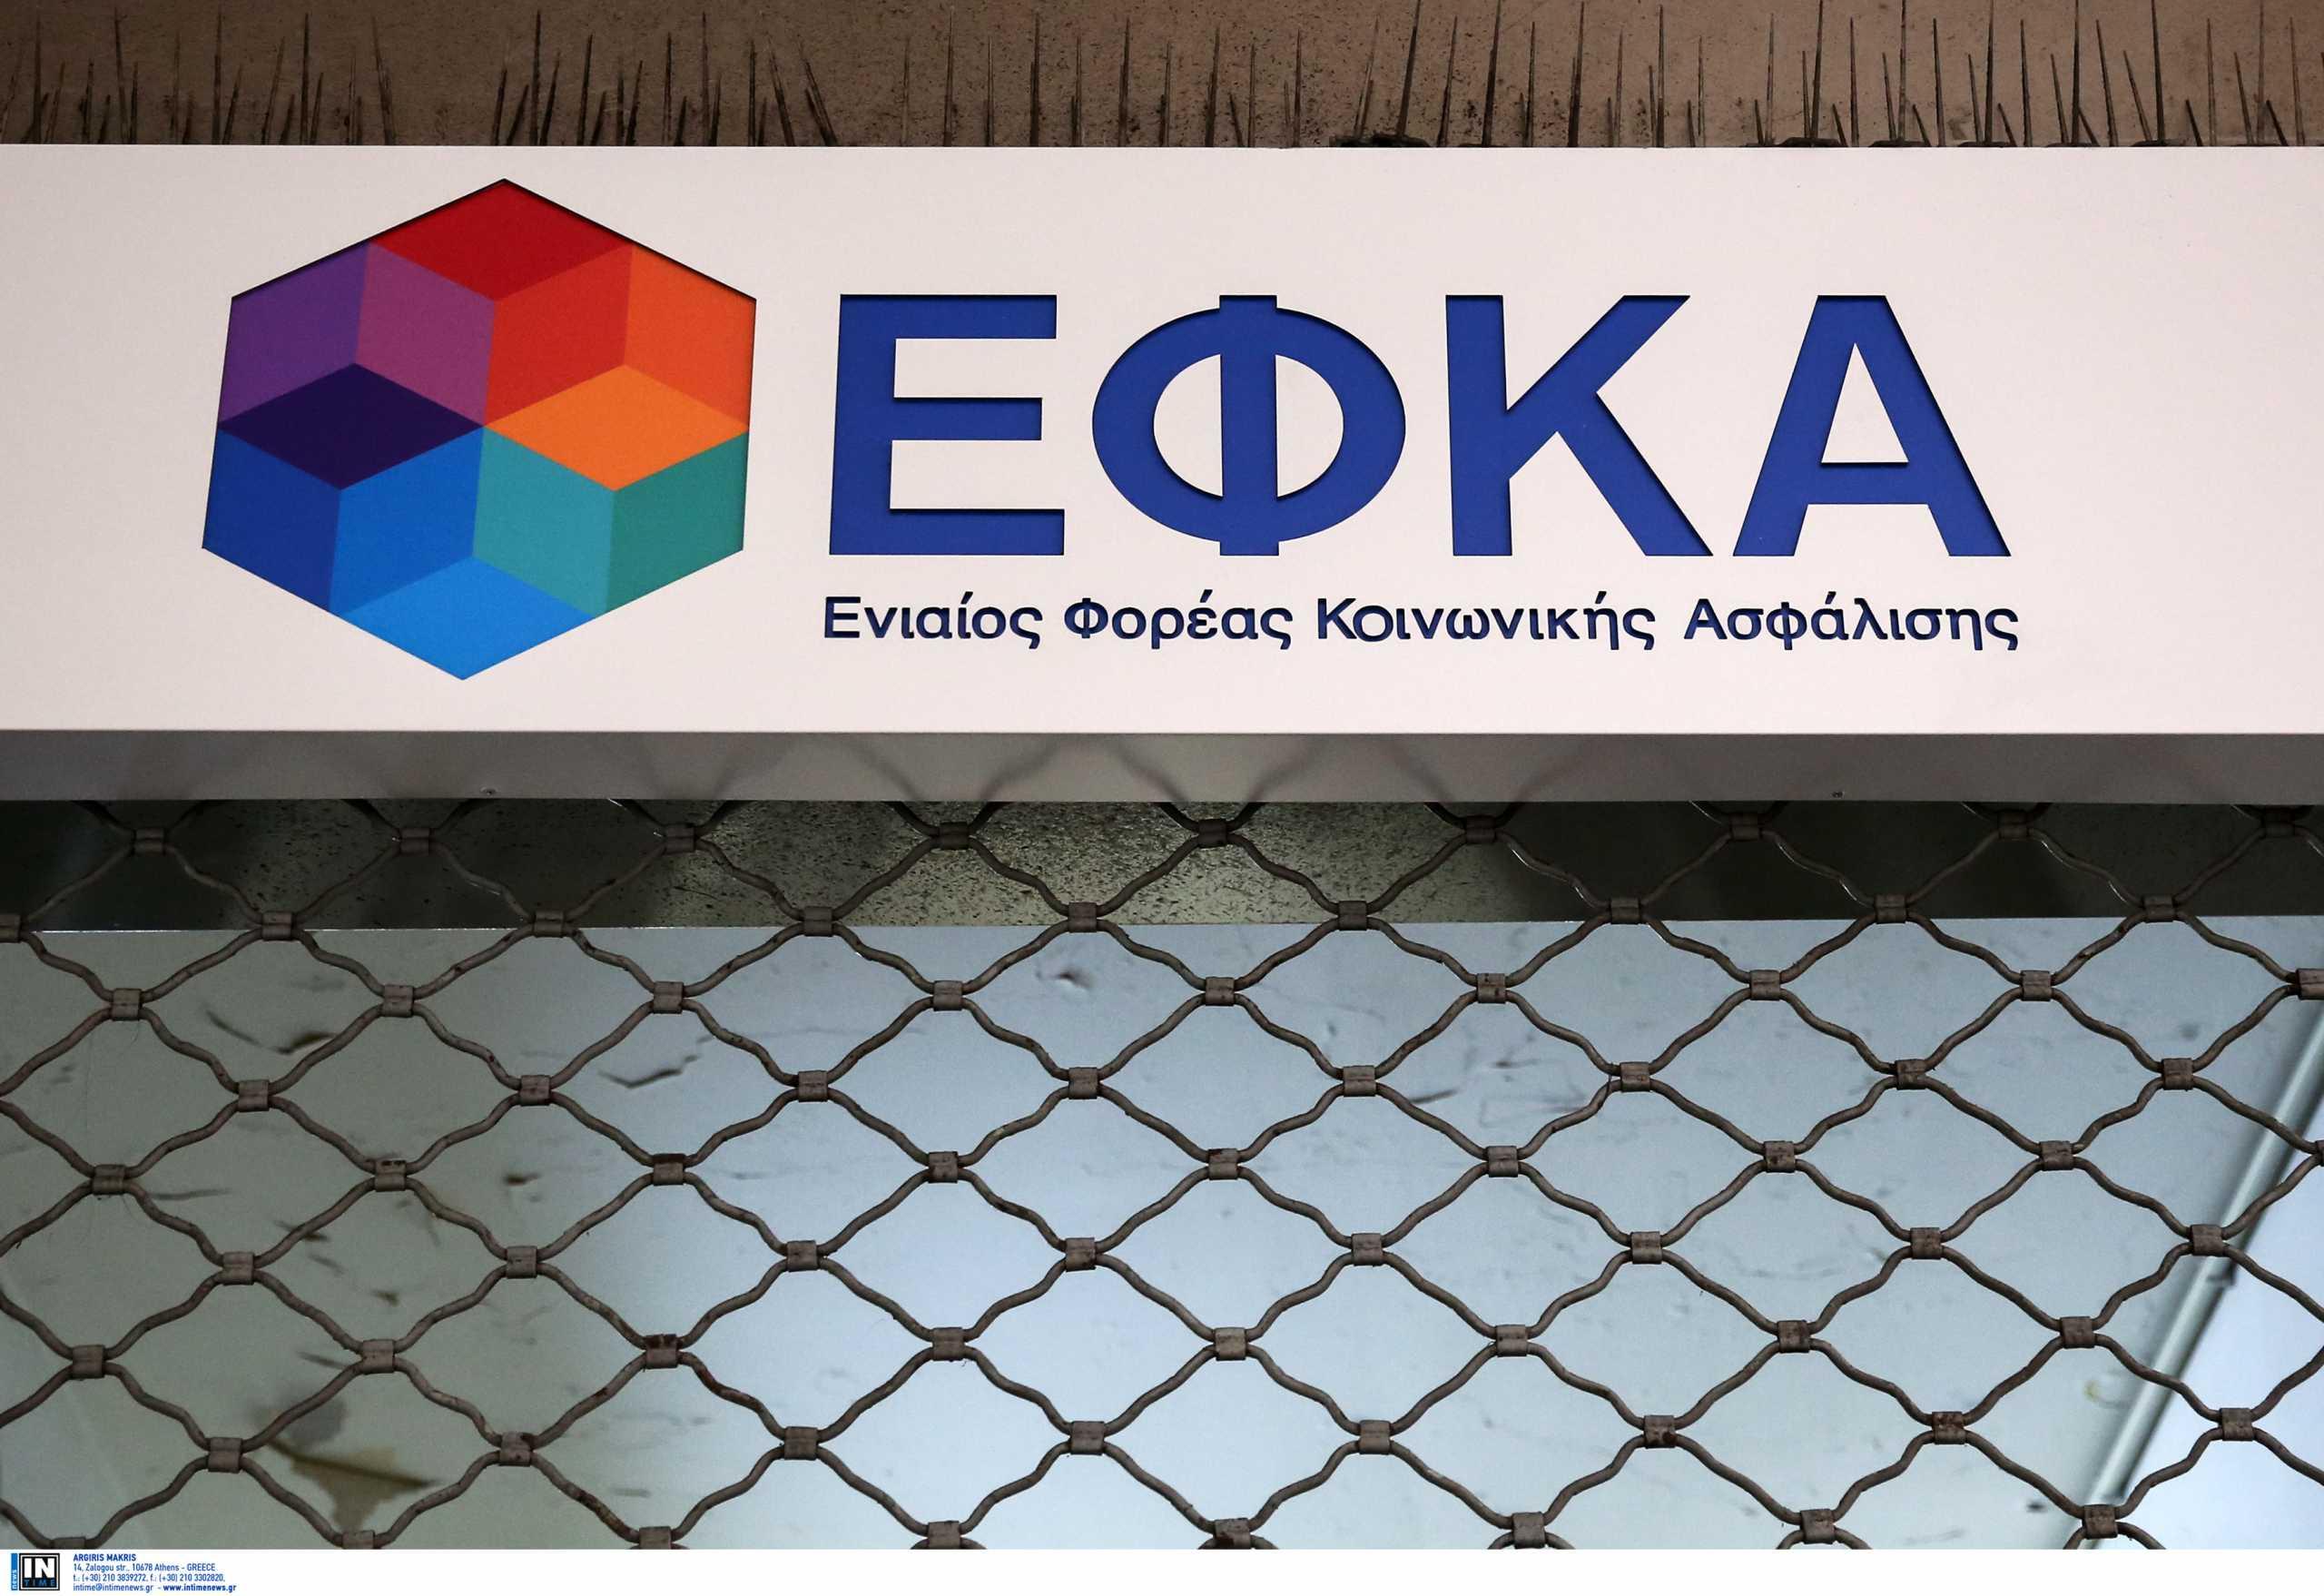 e-ΕΦΚΑ: Αυτές είναι οι ρυθμίσεις για τους πυρόπληκτους στην Εύβοια